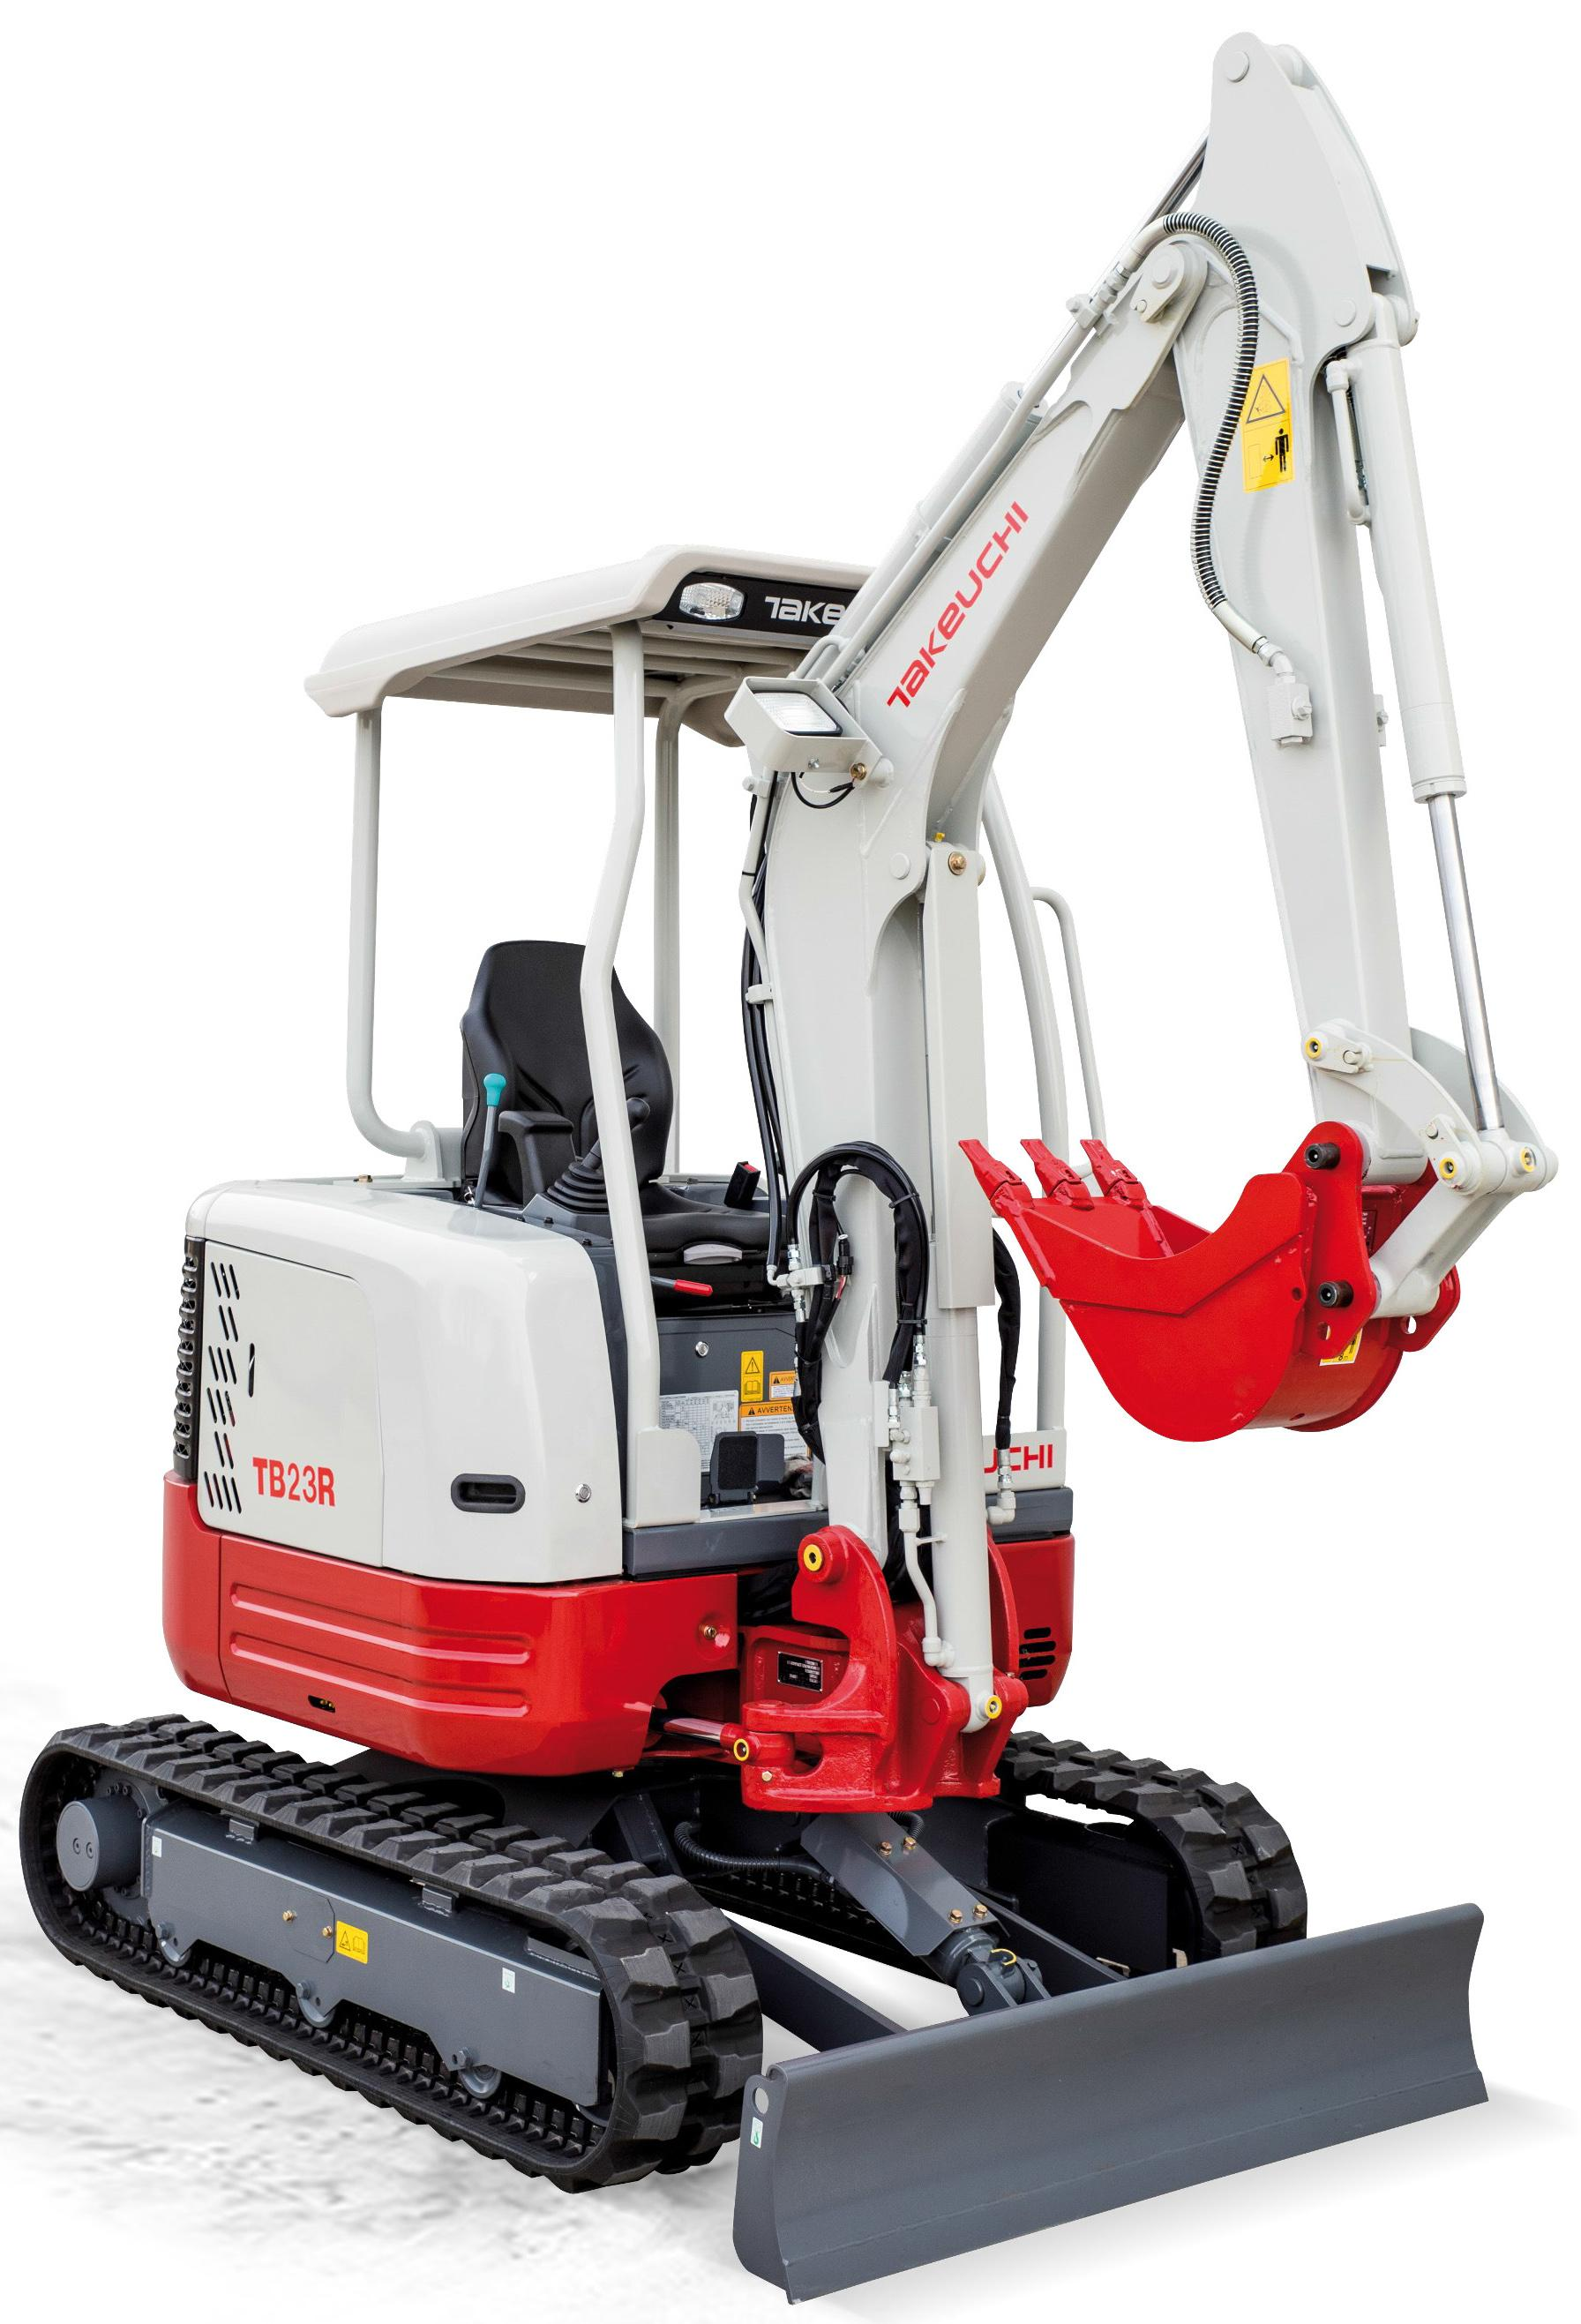 Takeuchi Compact Excavator Tb23r Factory Service  U0026 Shop